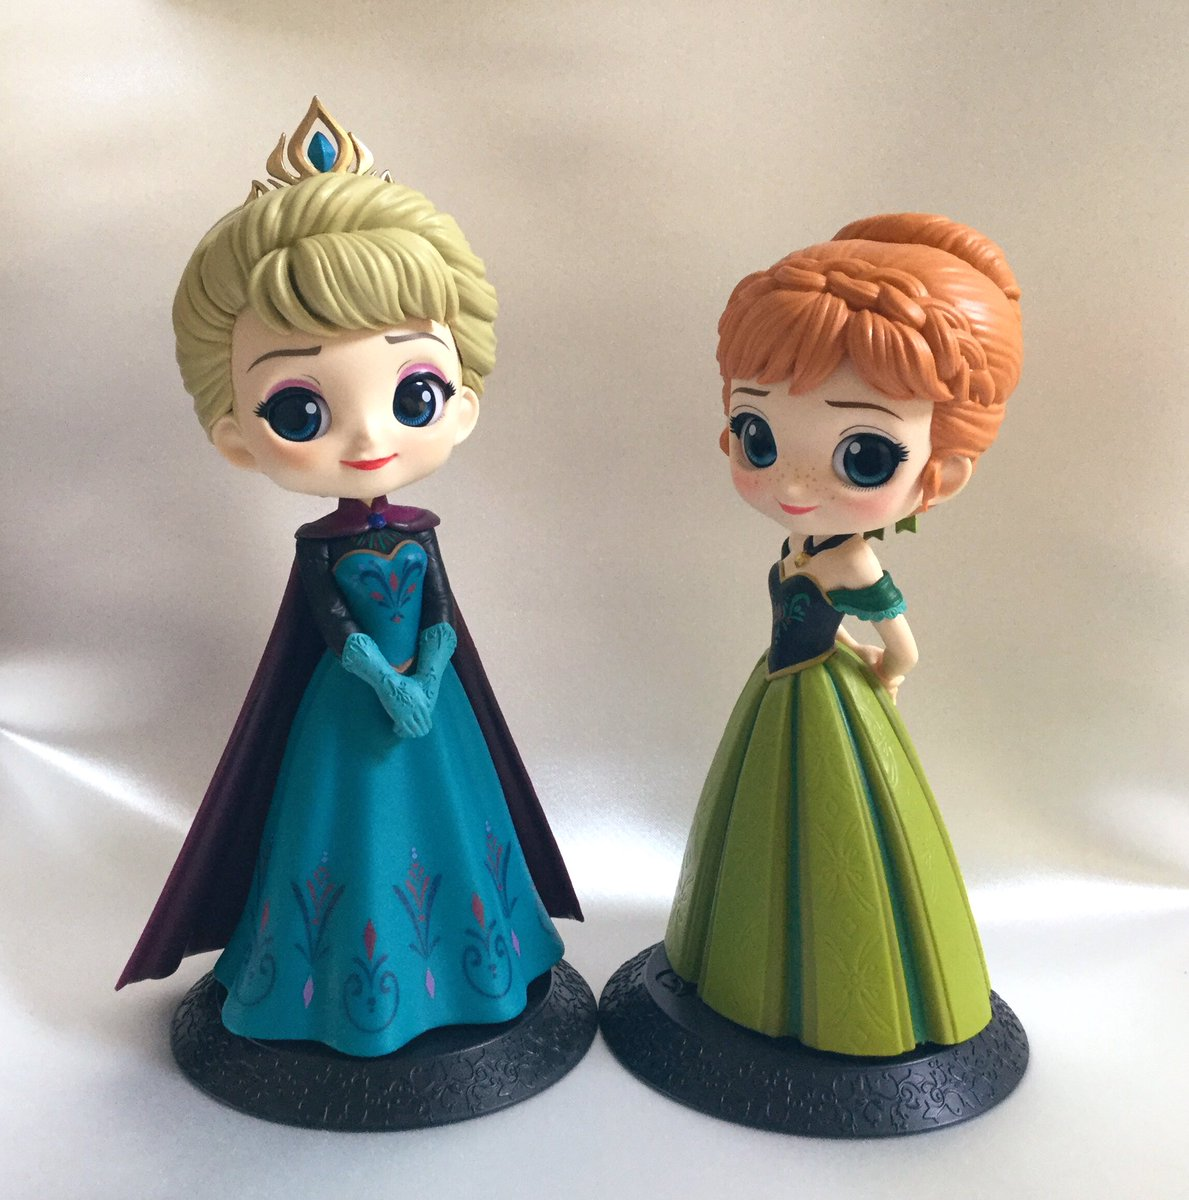 Qposket Disney Characters - Elsa & Anna Coronation Style -です❄️やっと一緒に飾る事が出来ました☺️💓  #Qposket #Disney #Frozen #Elsa #Anna #アナと雪の女王 #エルサ #アナ #戴冠式 https://t.co/OS1ta5CsPR